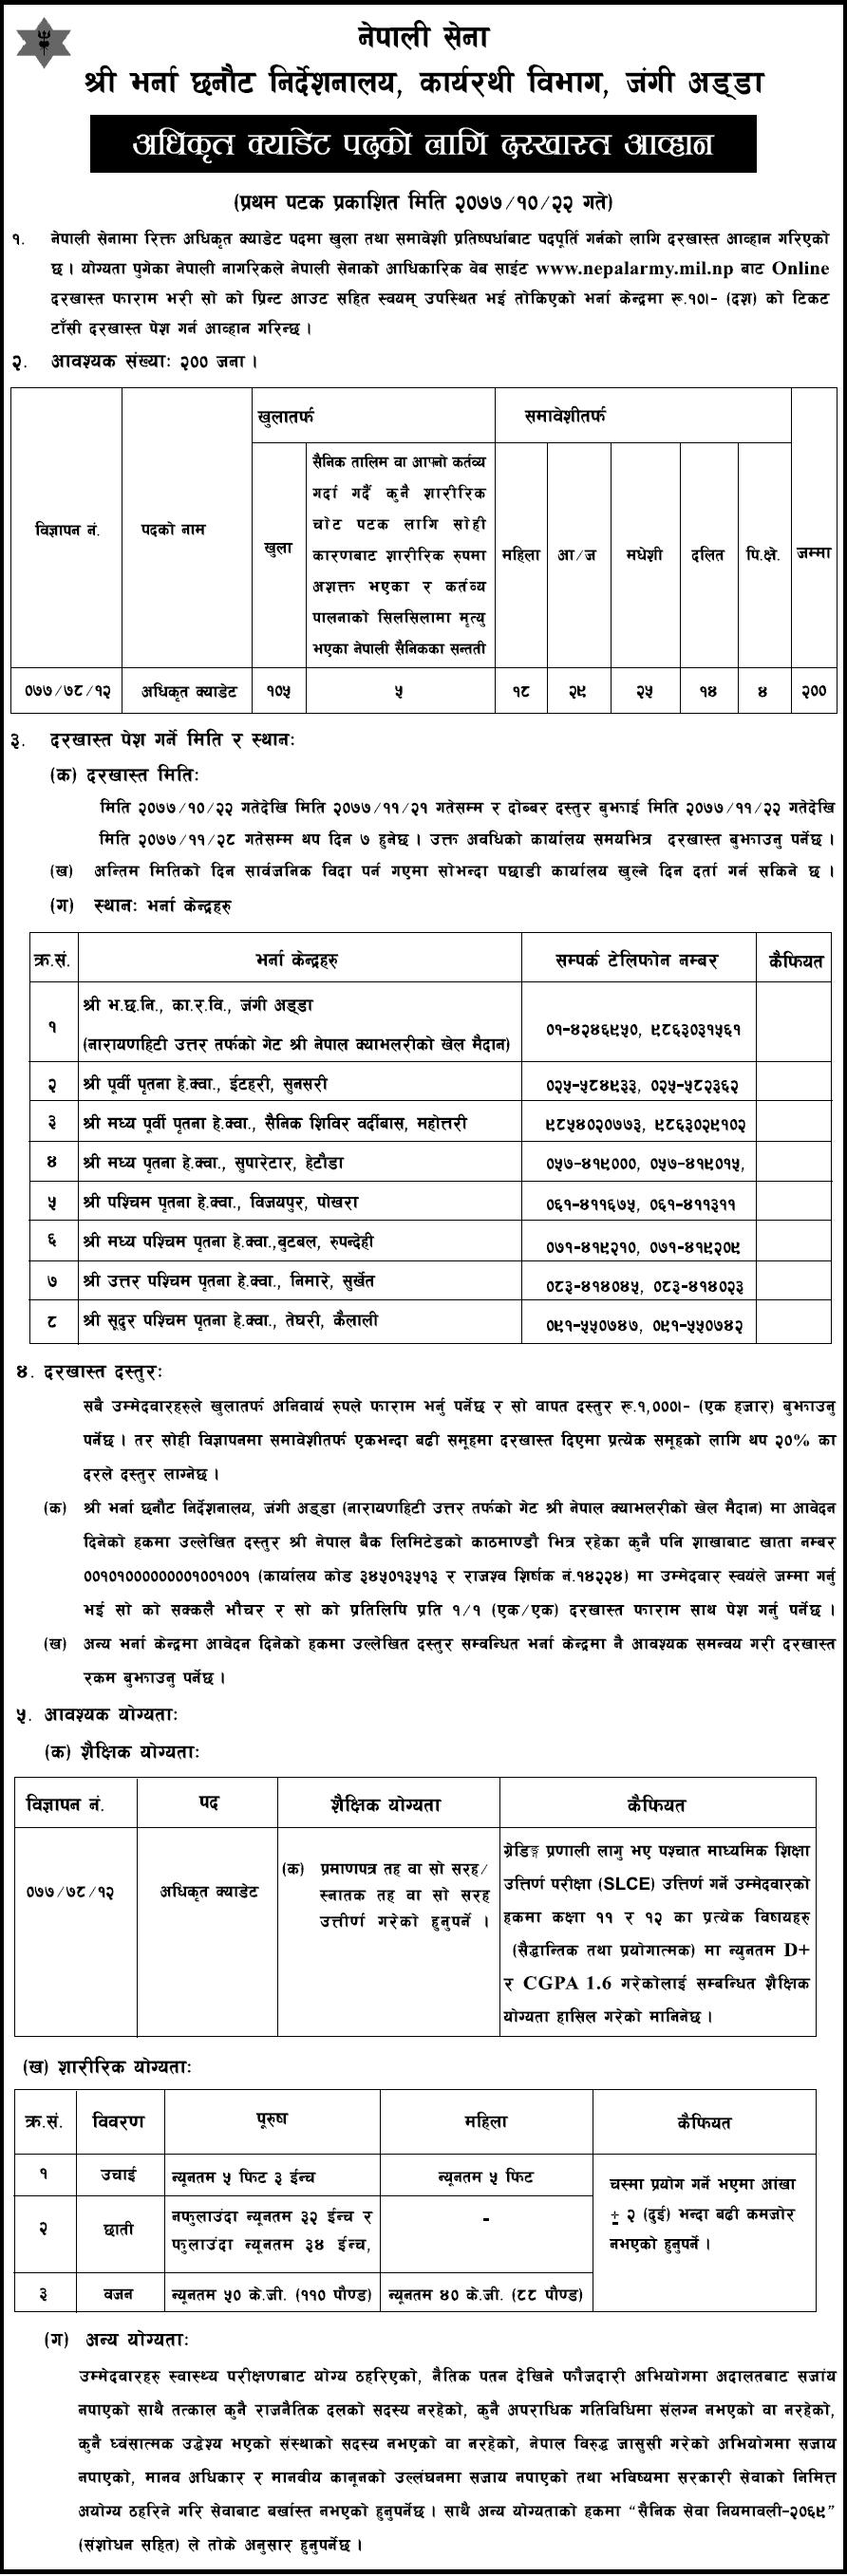 Nepal Army Officer Cadet Vacancy 2077